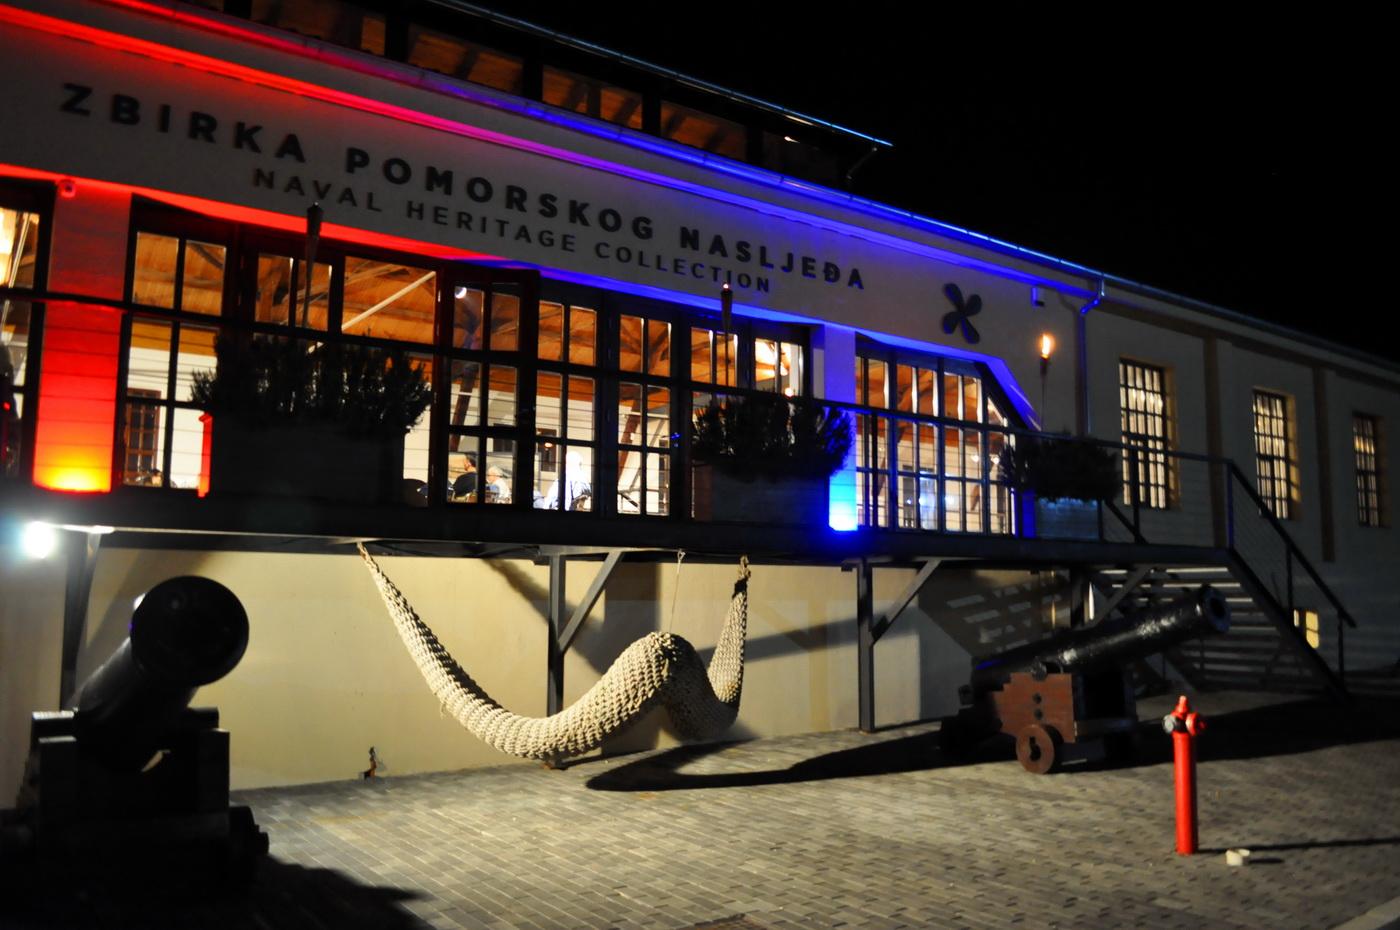 Zbirka pomorskog nasljeđa - Porto Montenegro